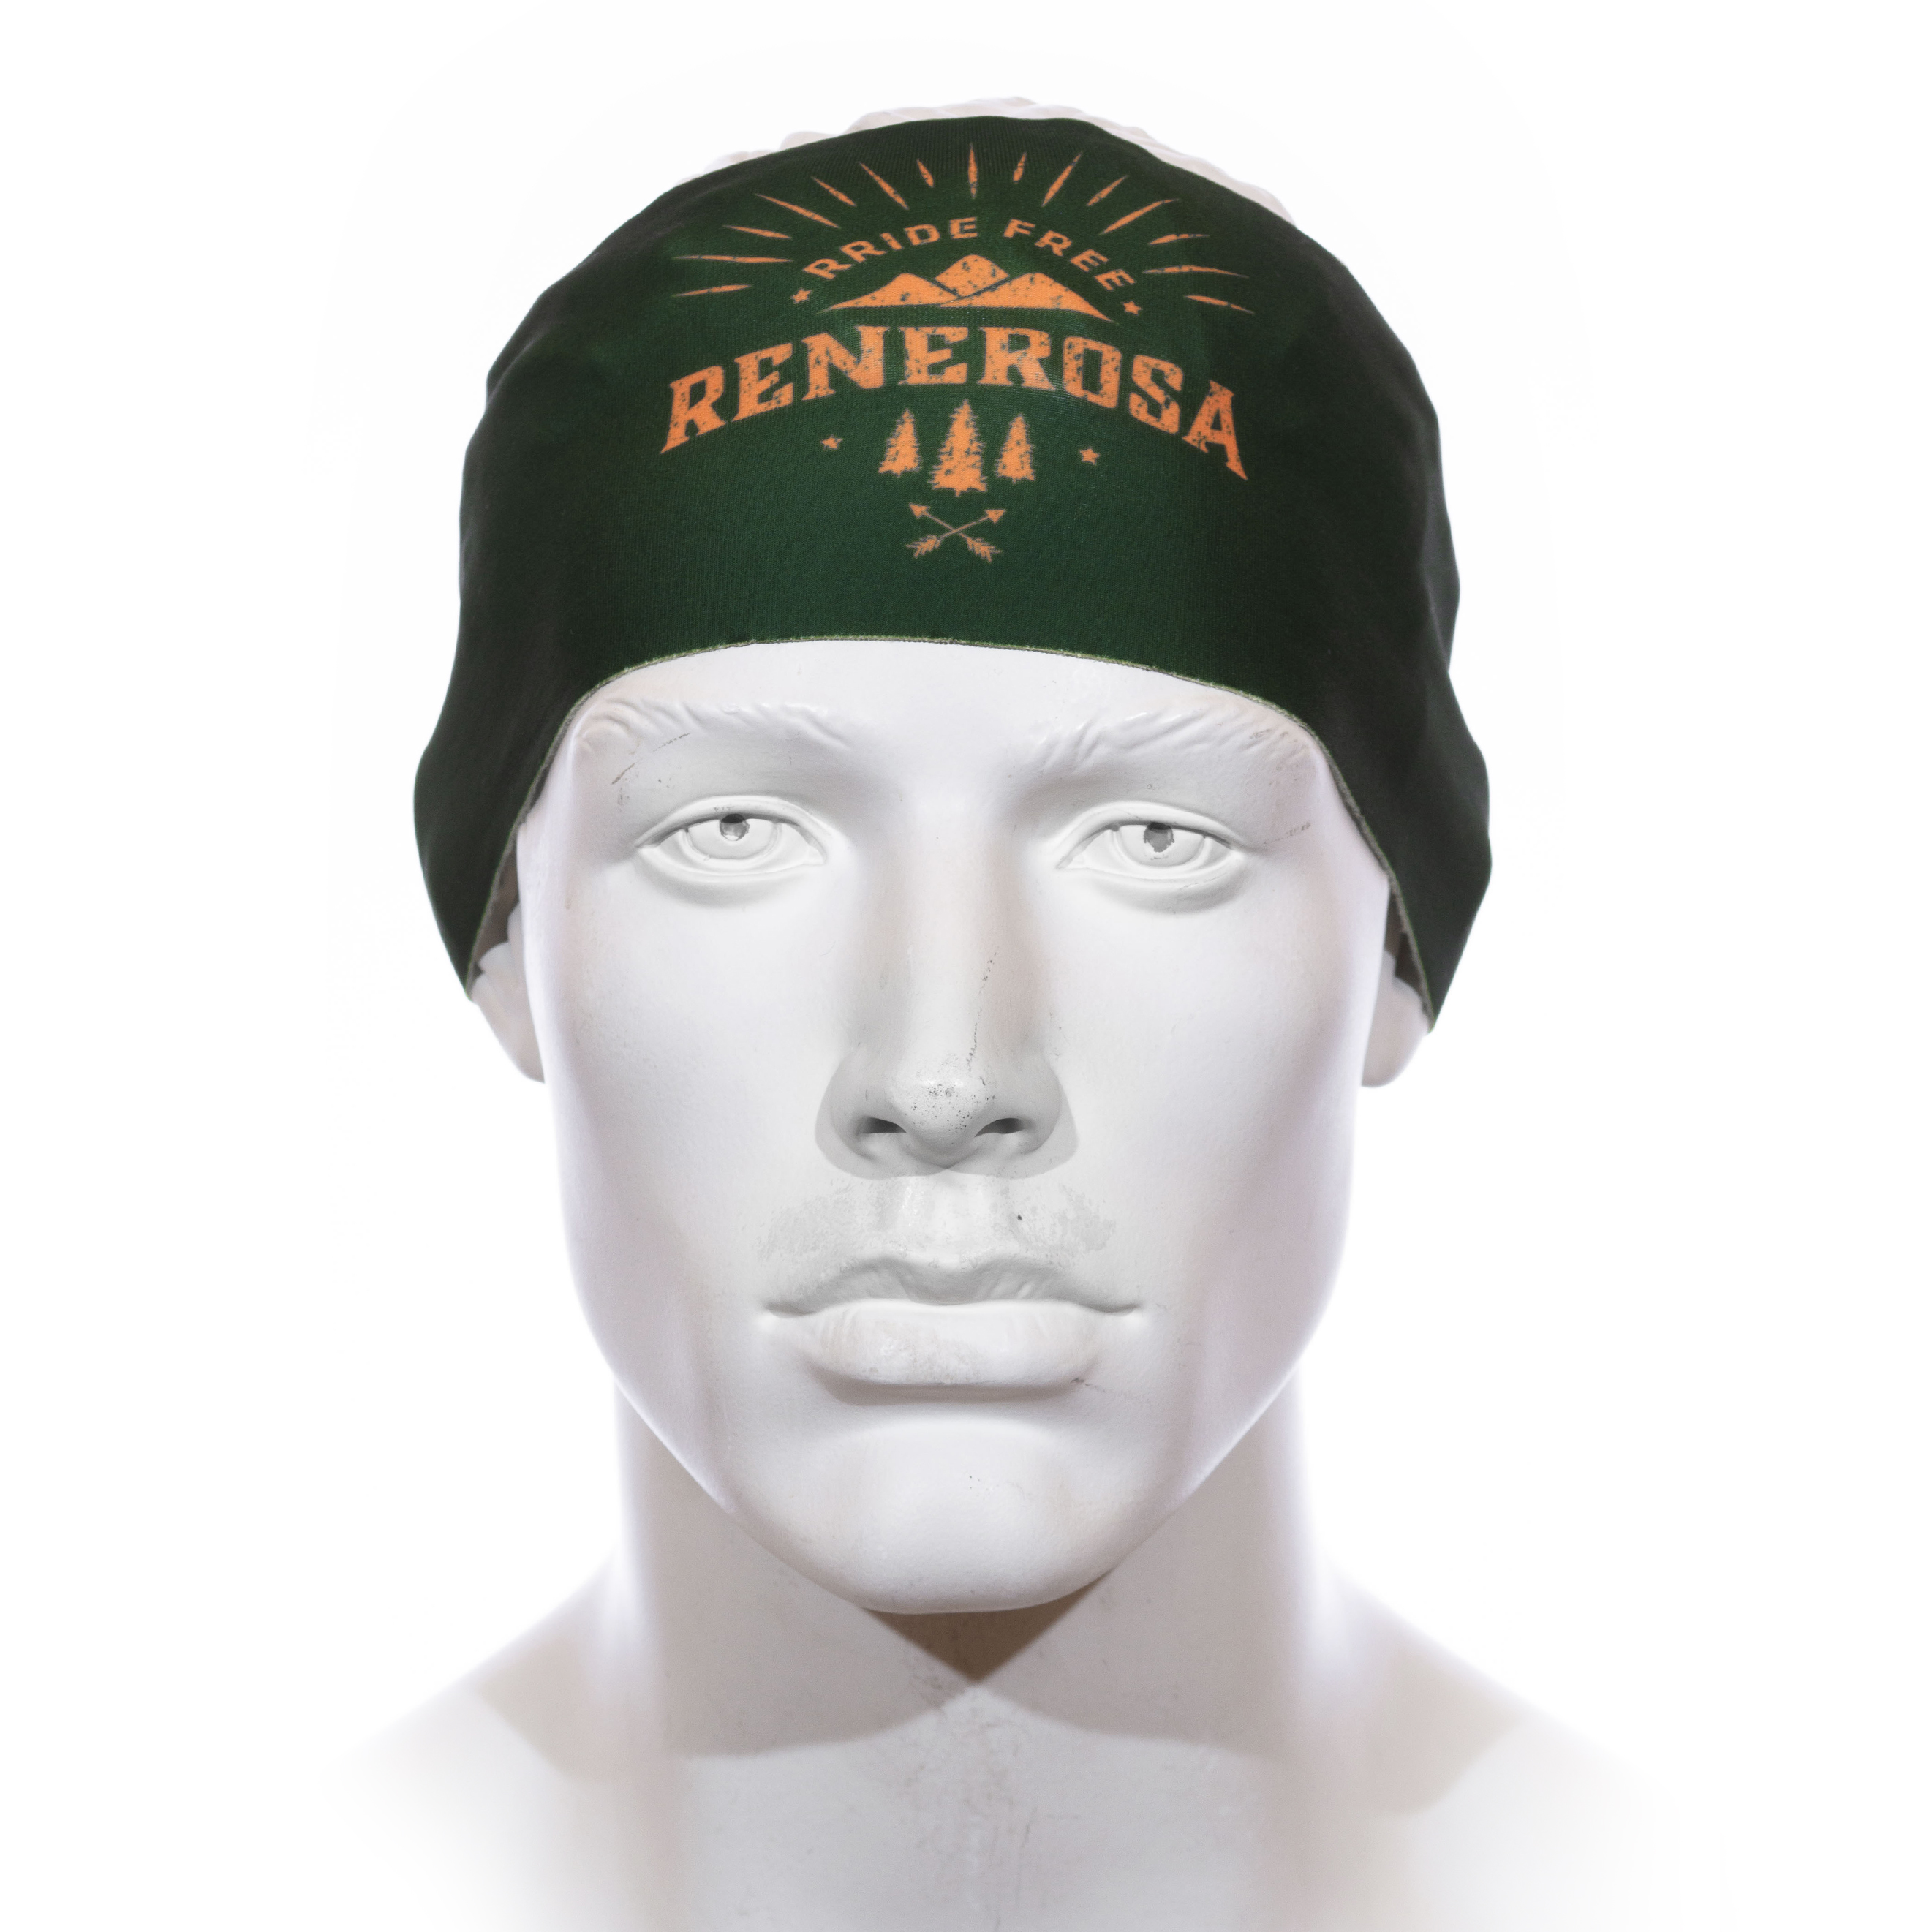 Stirnband Langläufer RRT991U / RRideFree GrünOrange